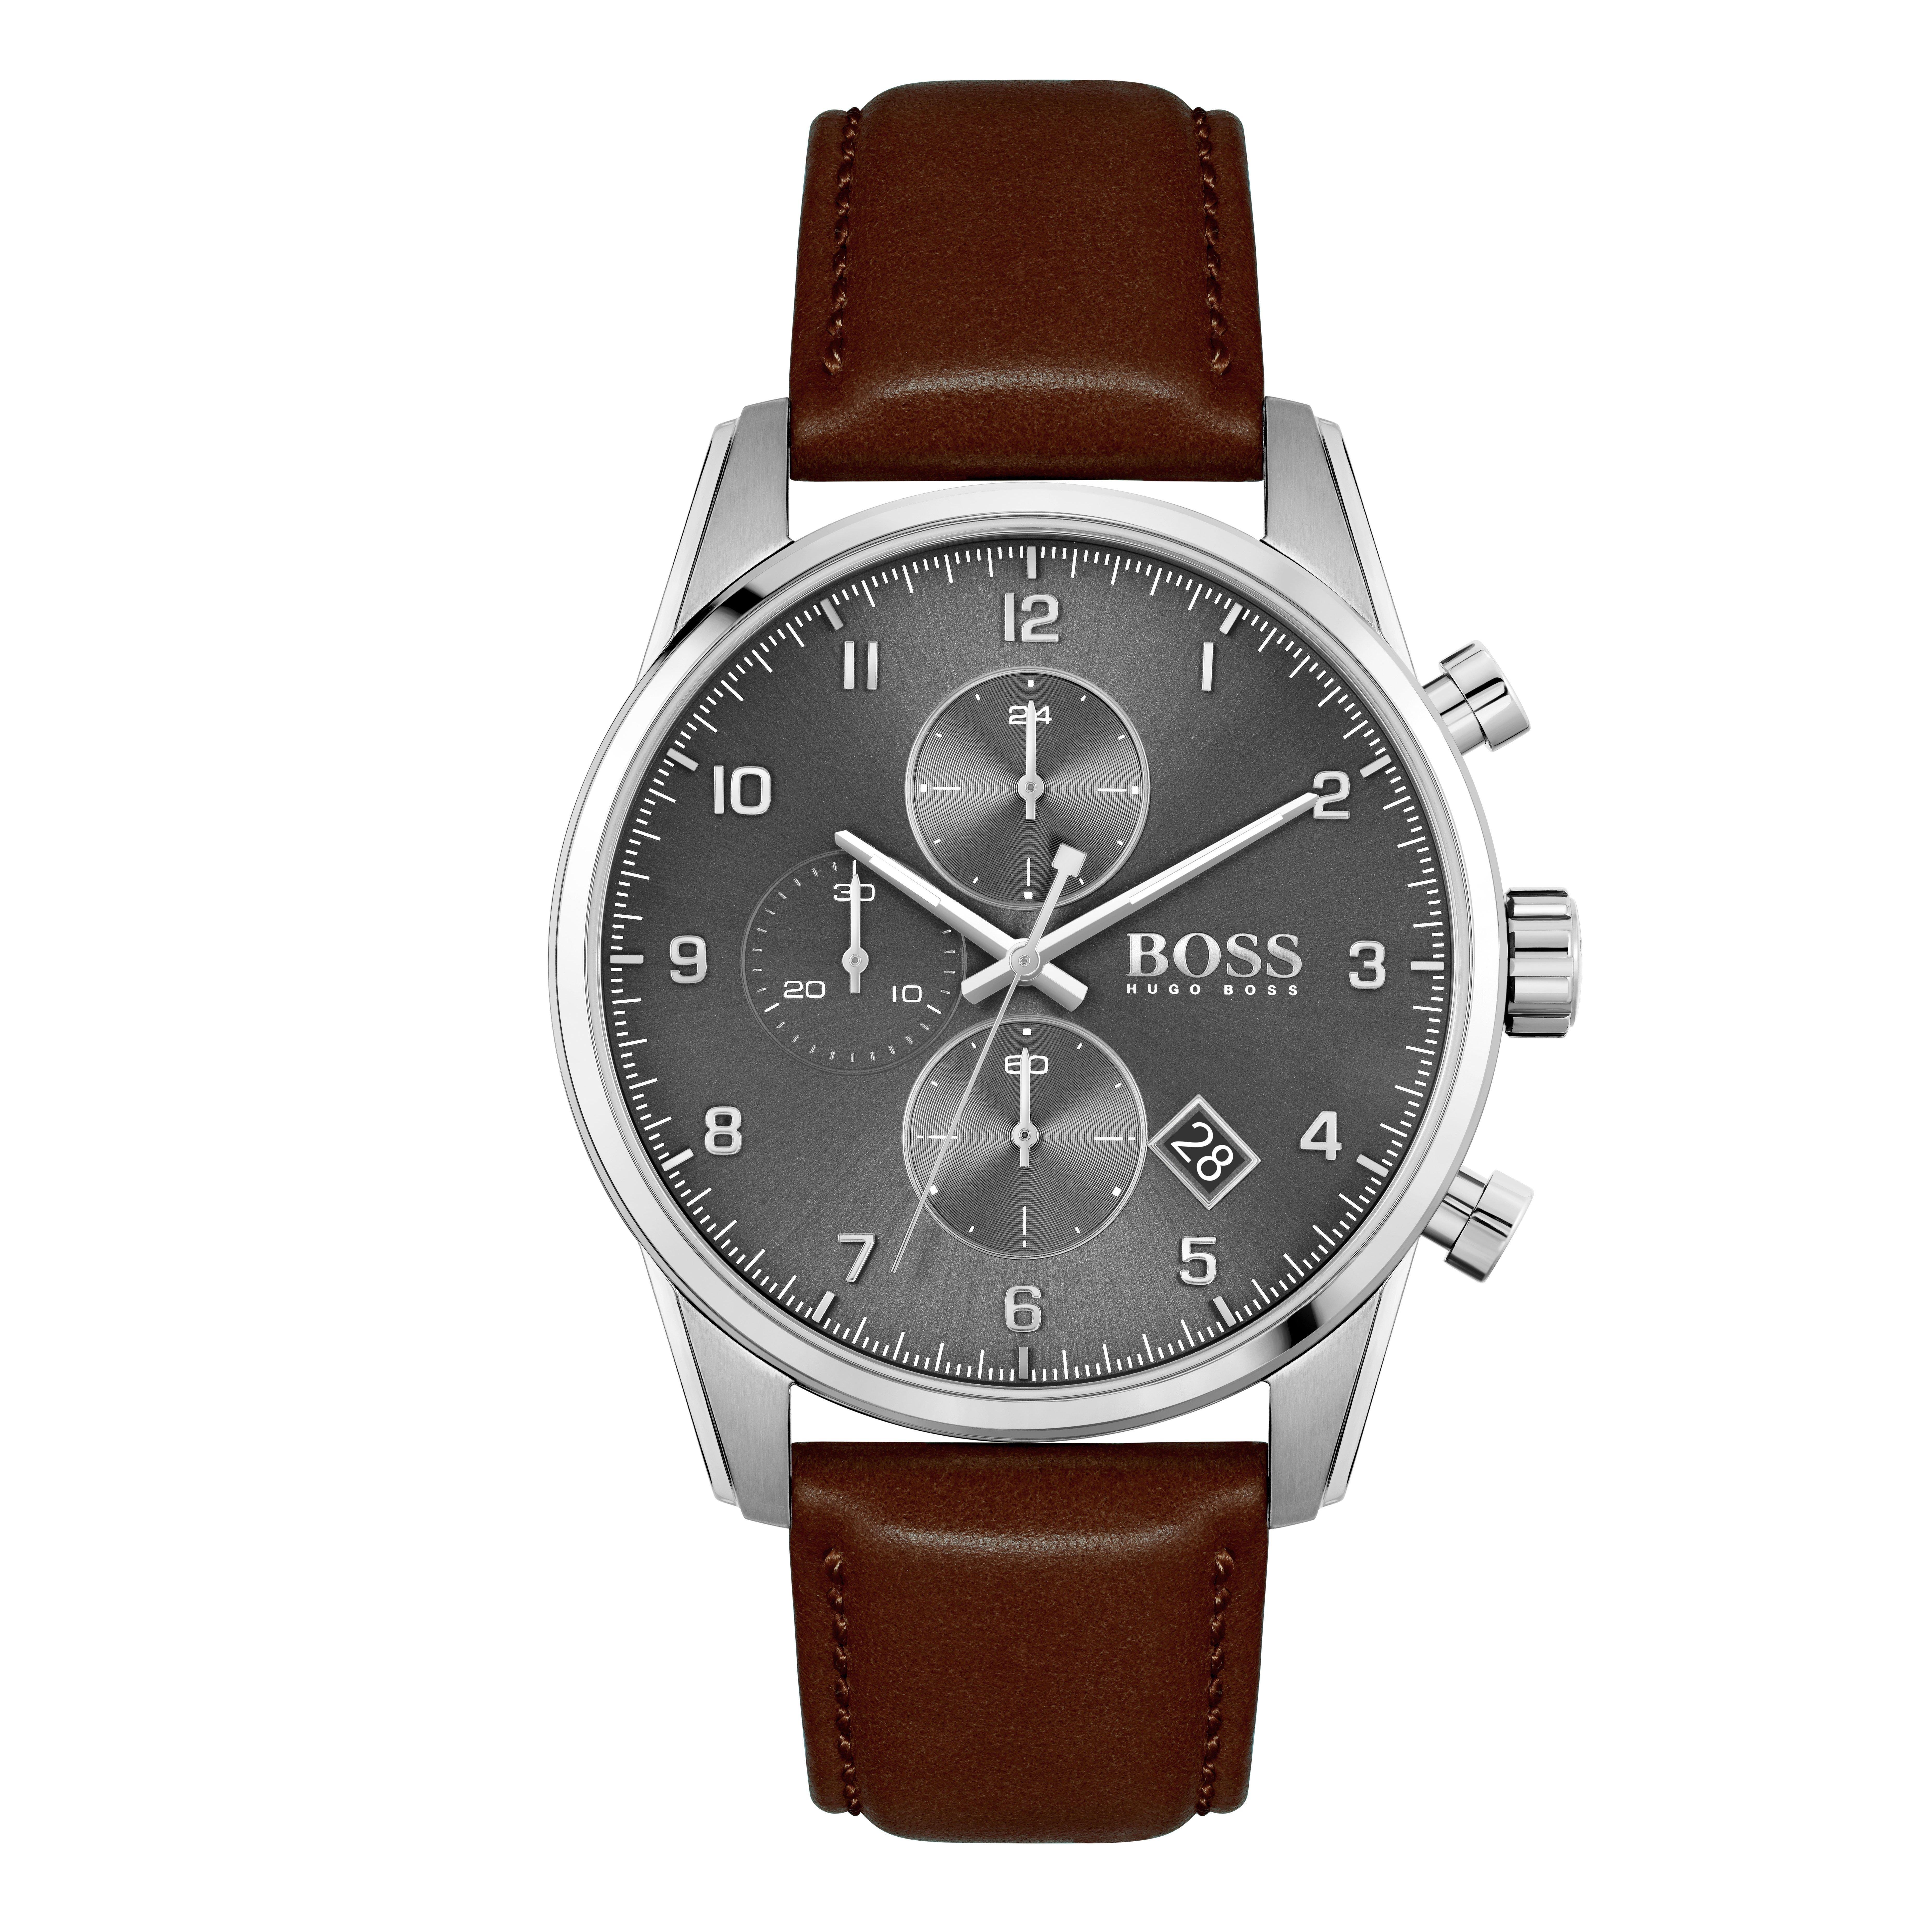 BOSS Skymaster Chronograph Men's Watch